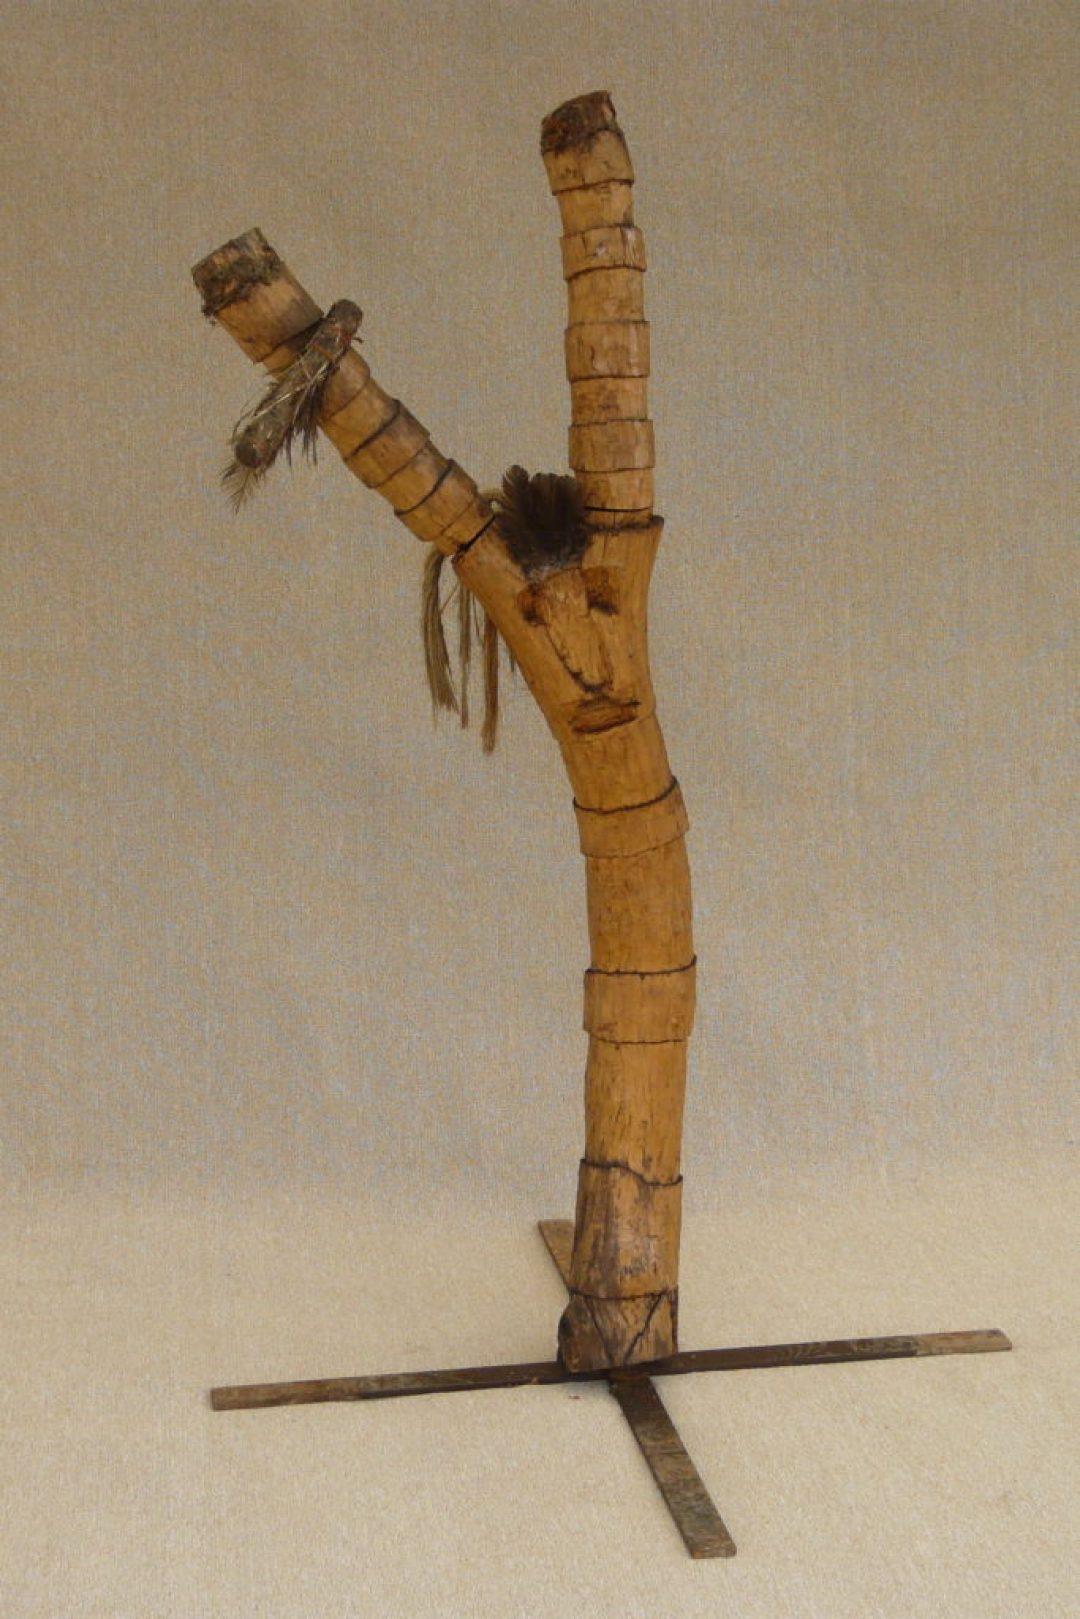 Jean-Marie Heyligen, Indien, sculptures sur bois (photo Prodia)